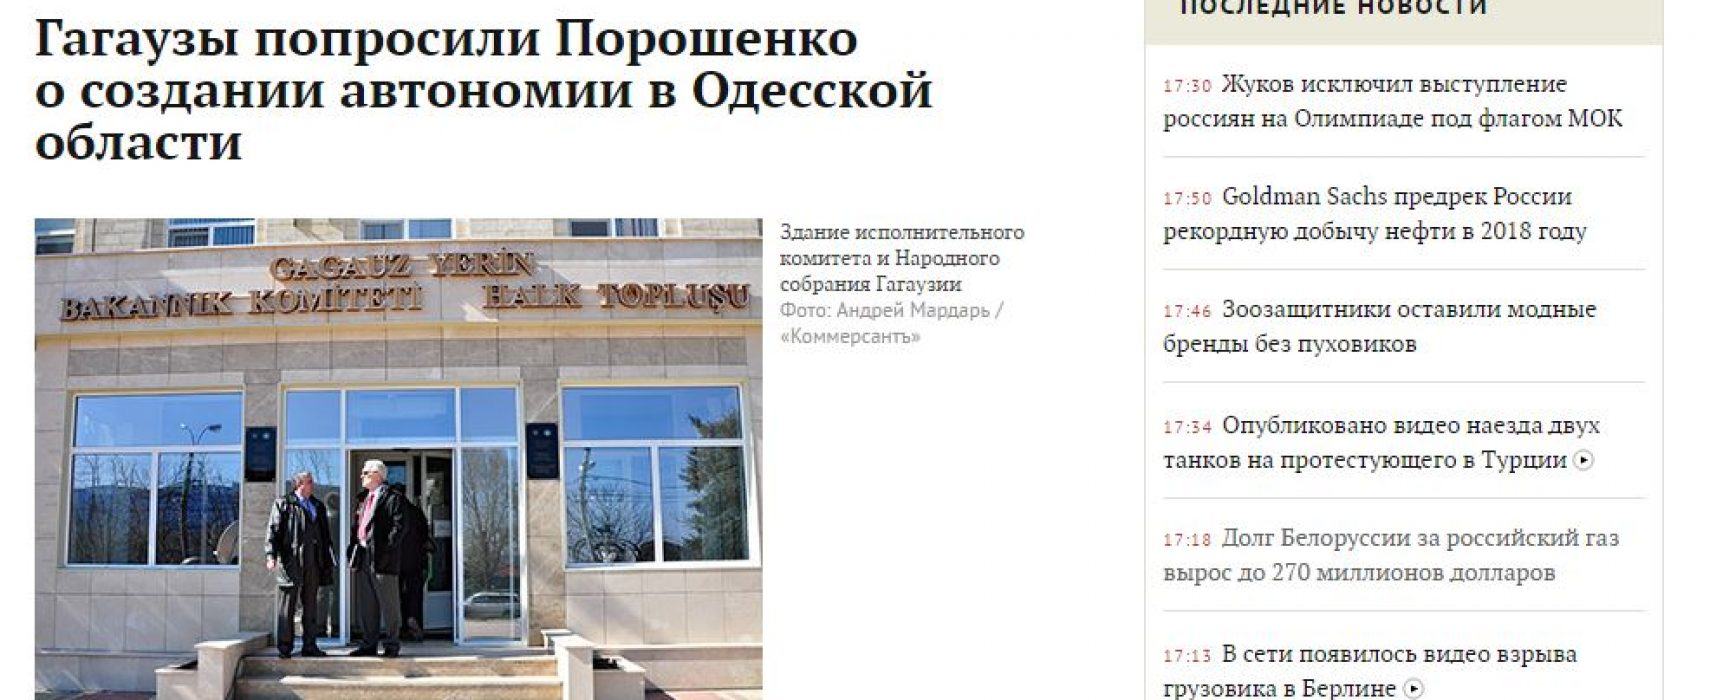 Fake: Oekraïense Gagaoezen eisen autonomie